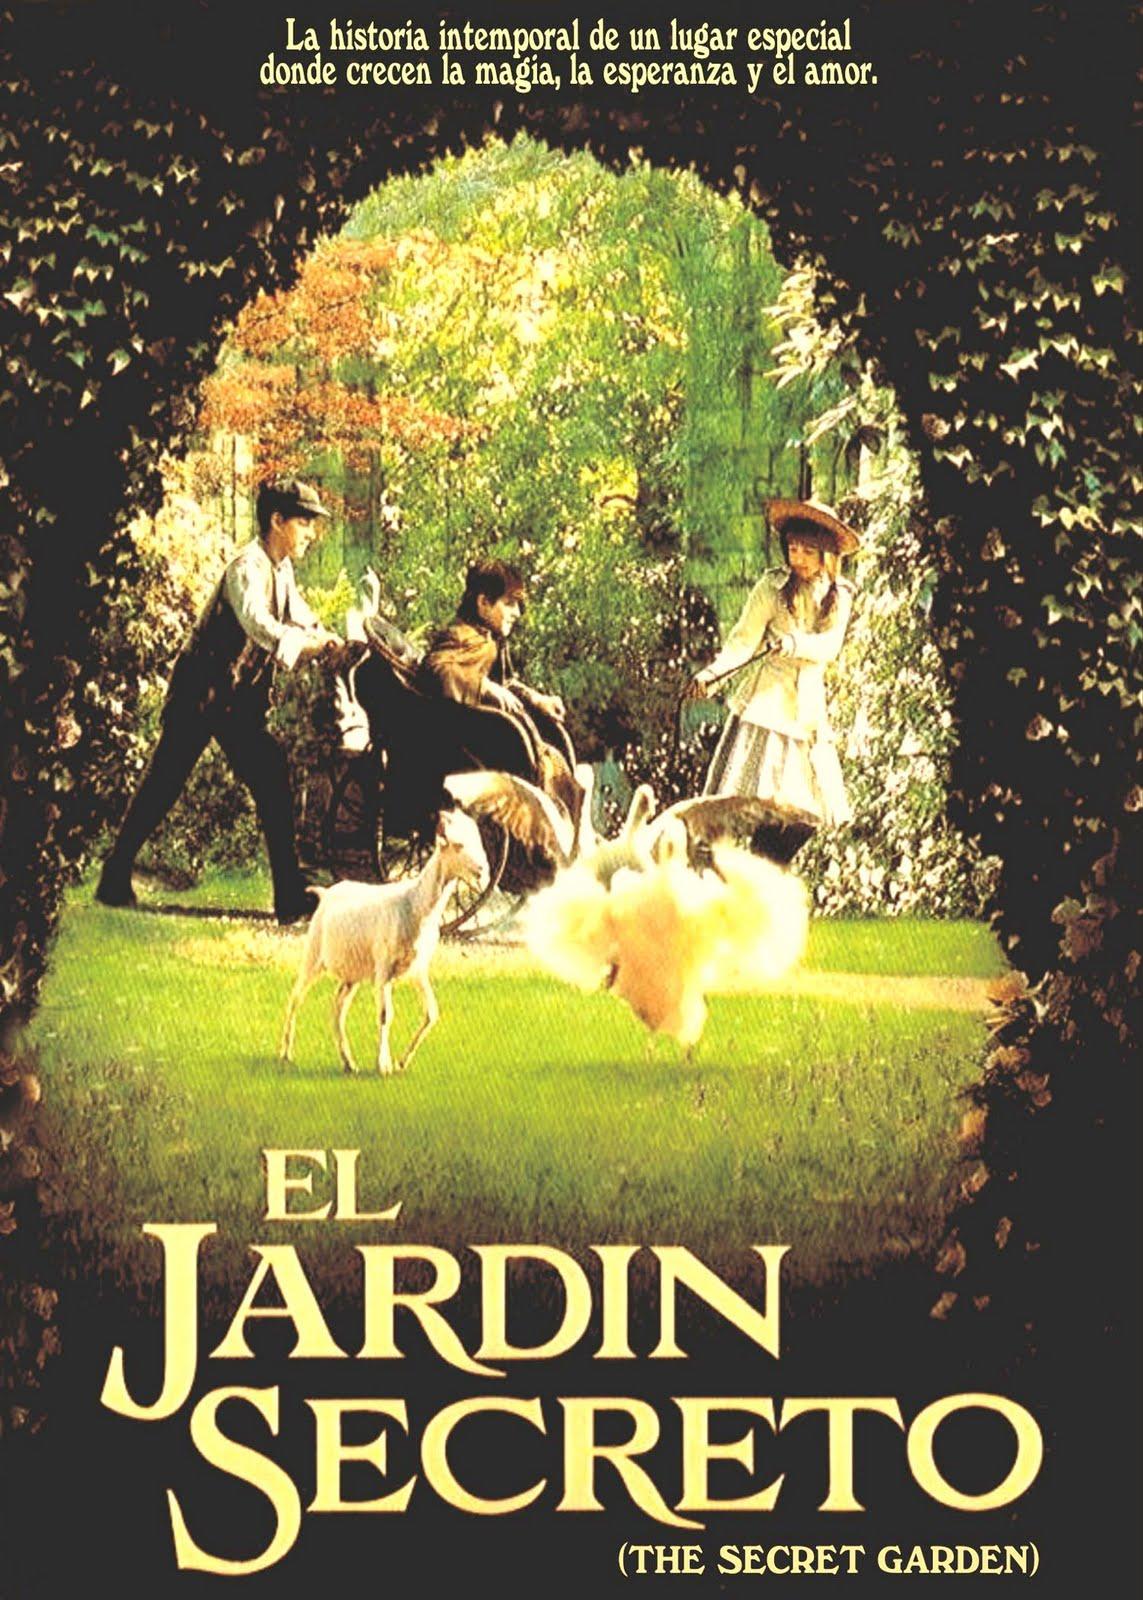 Jardin secreto imagens v rias id ias de for Cancion de la pelicula el jardin secreto